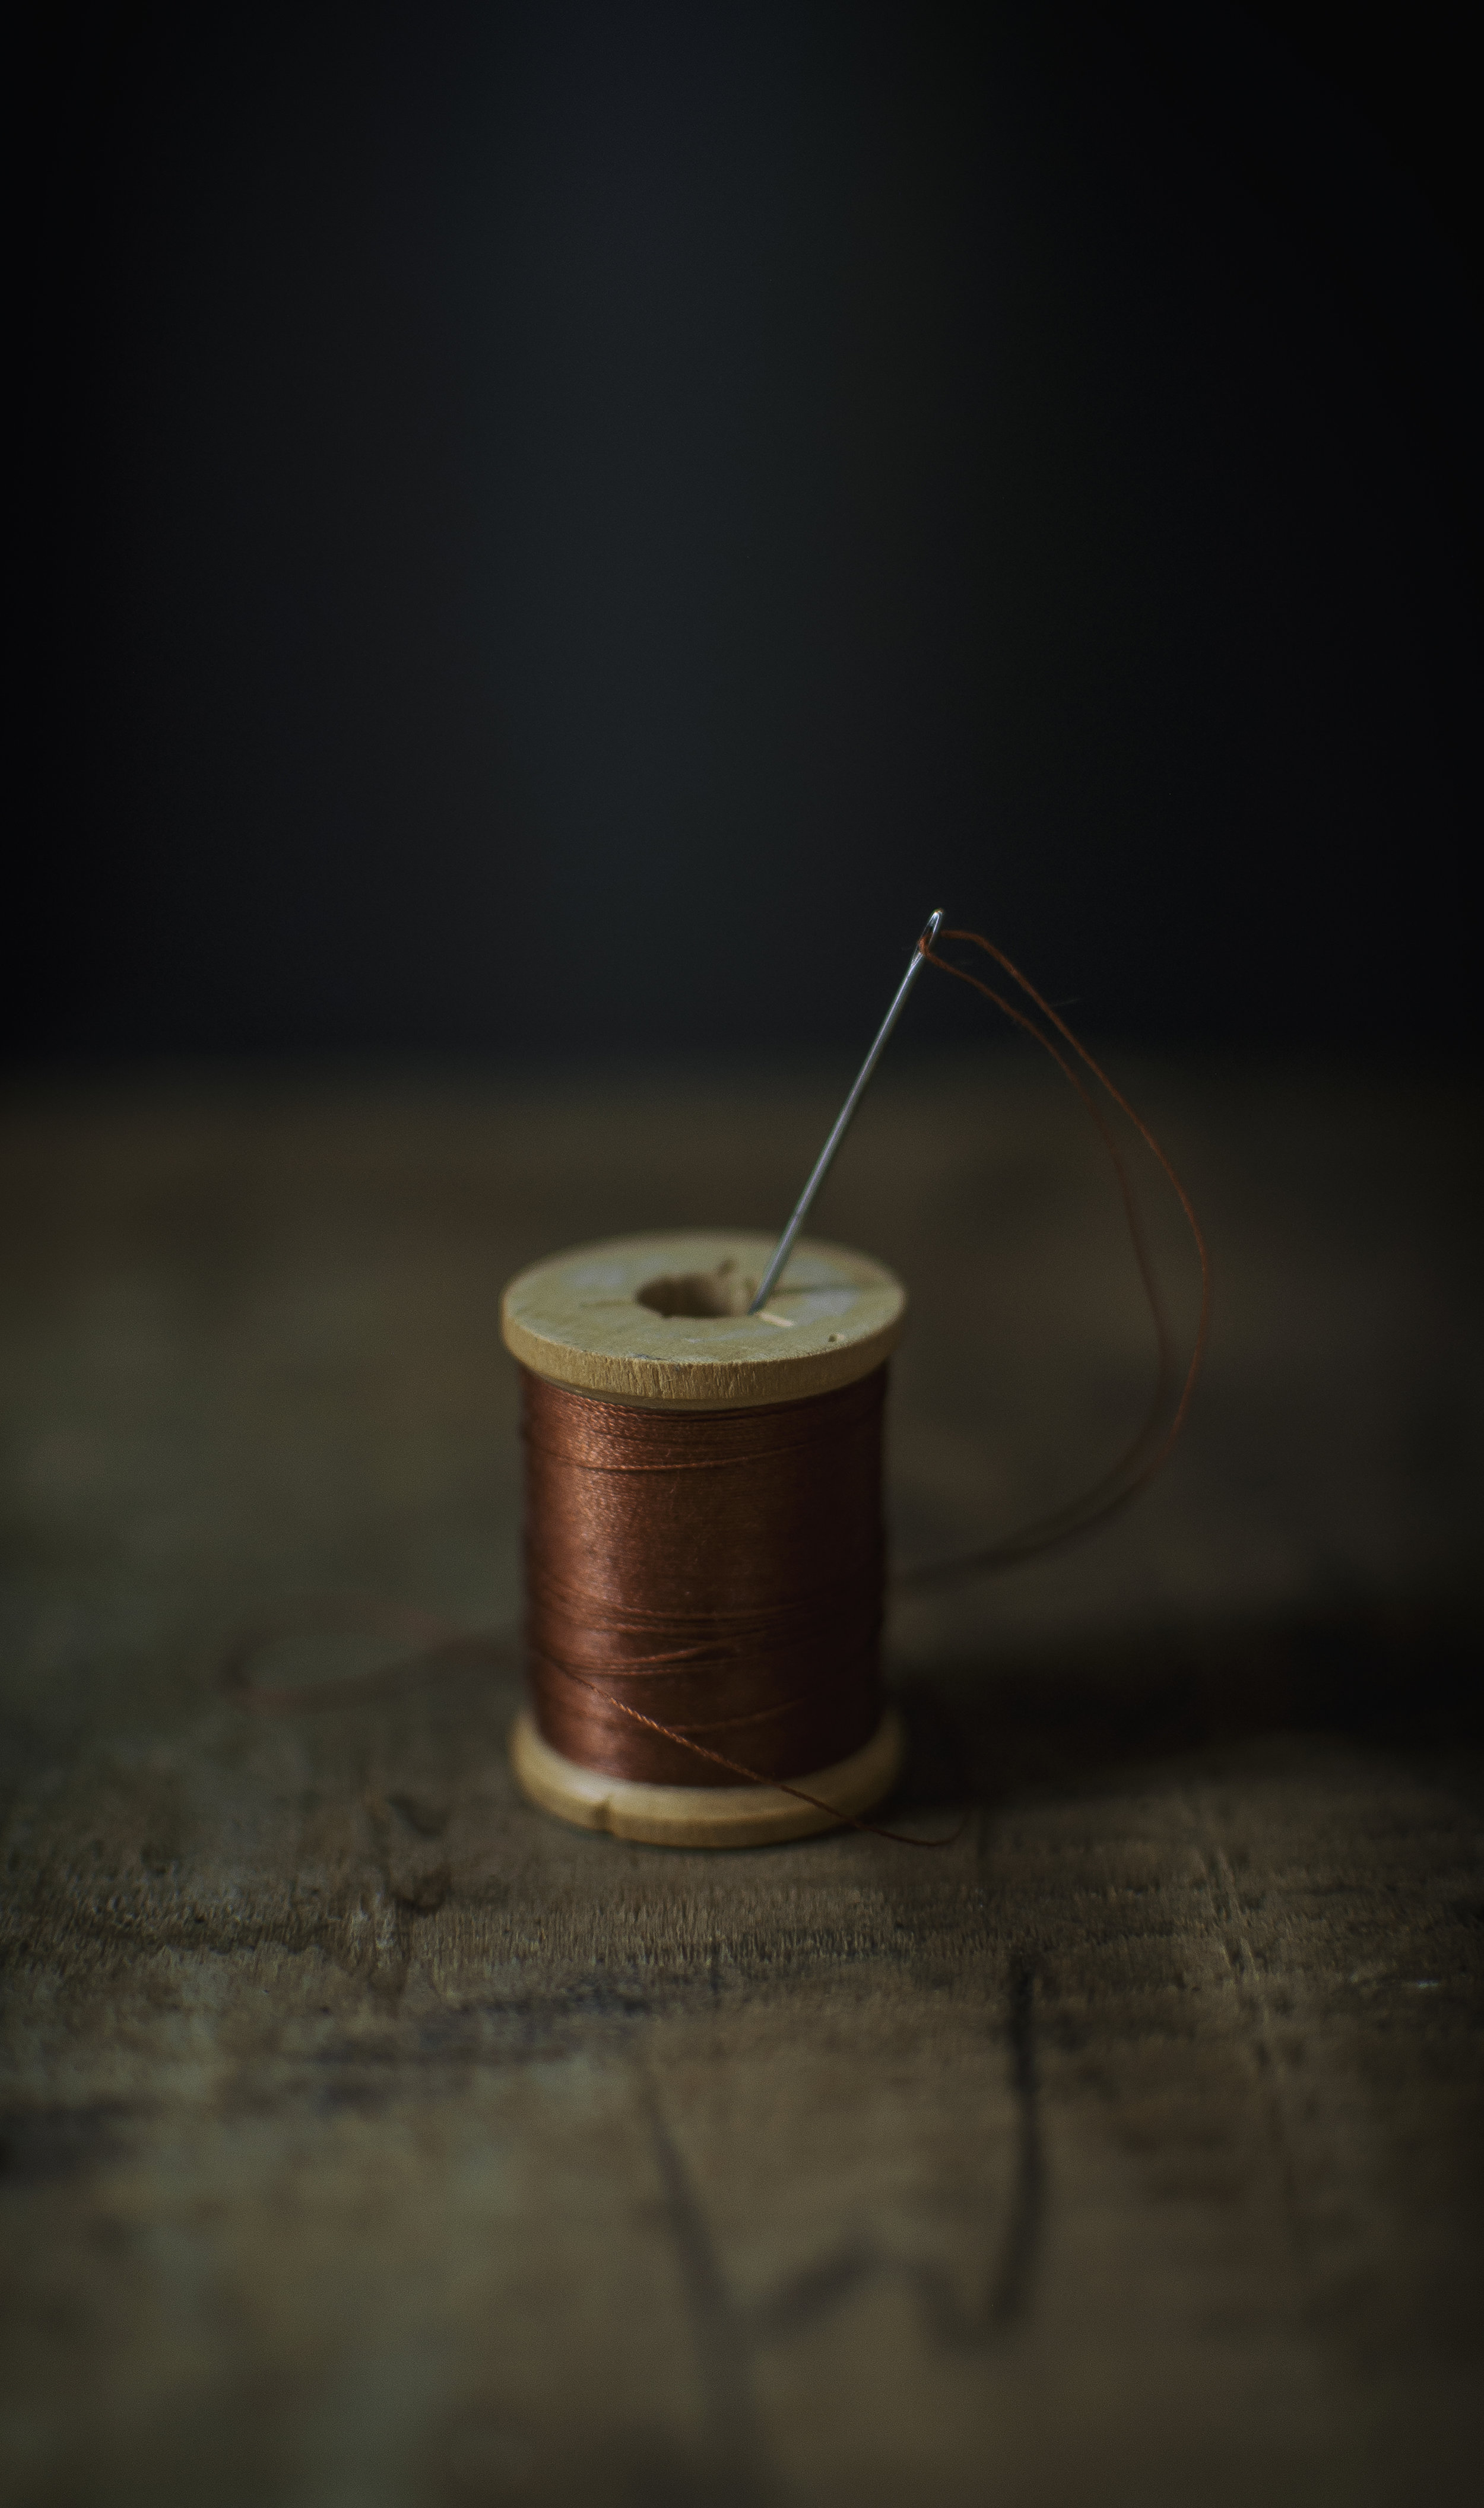 Objects_Sewing003.jpg